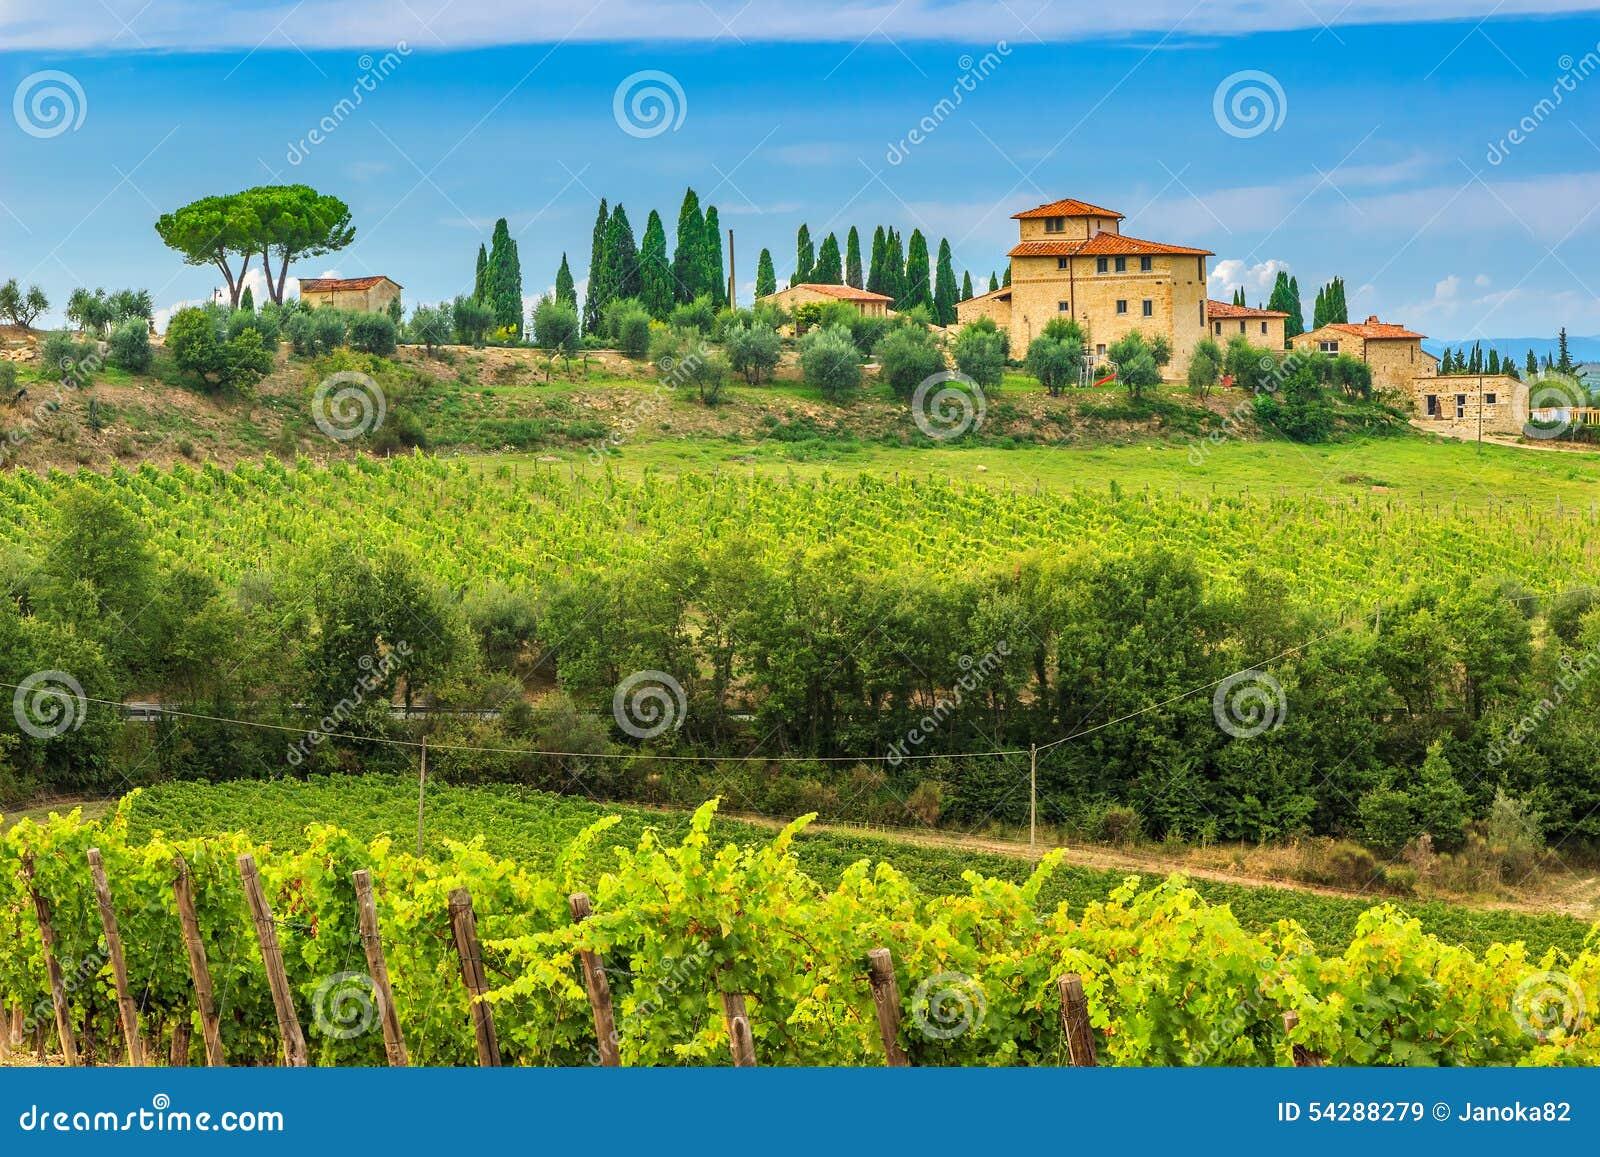 Chianti与石房子,托斯卡纳,意大利,欧洲的葡萄园风景